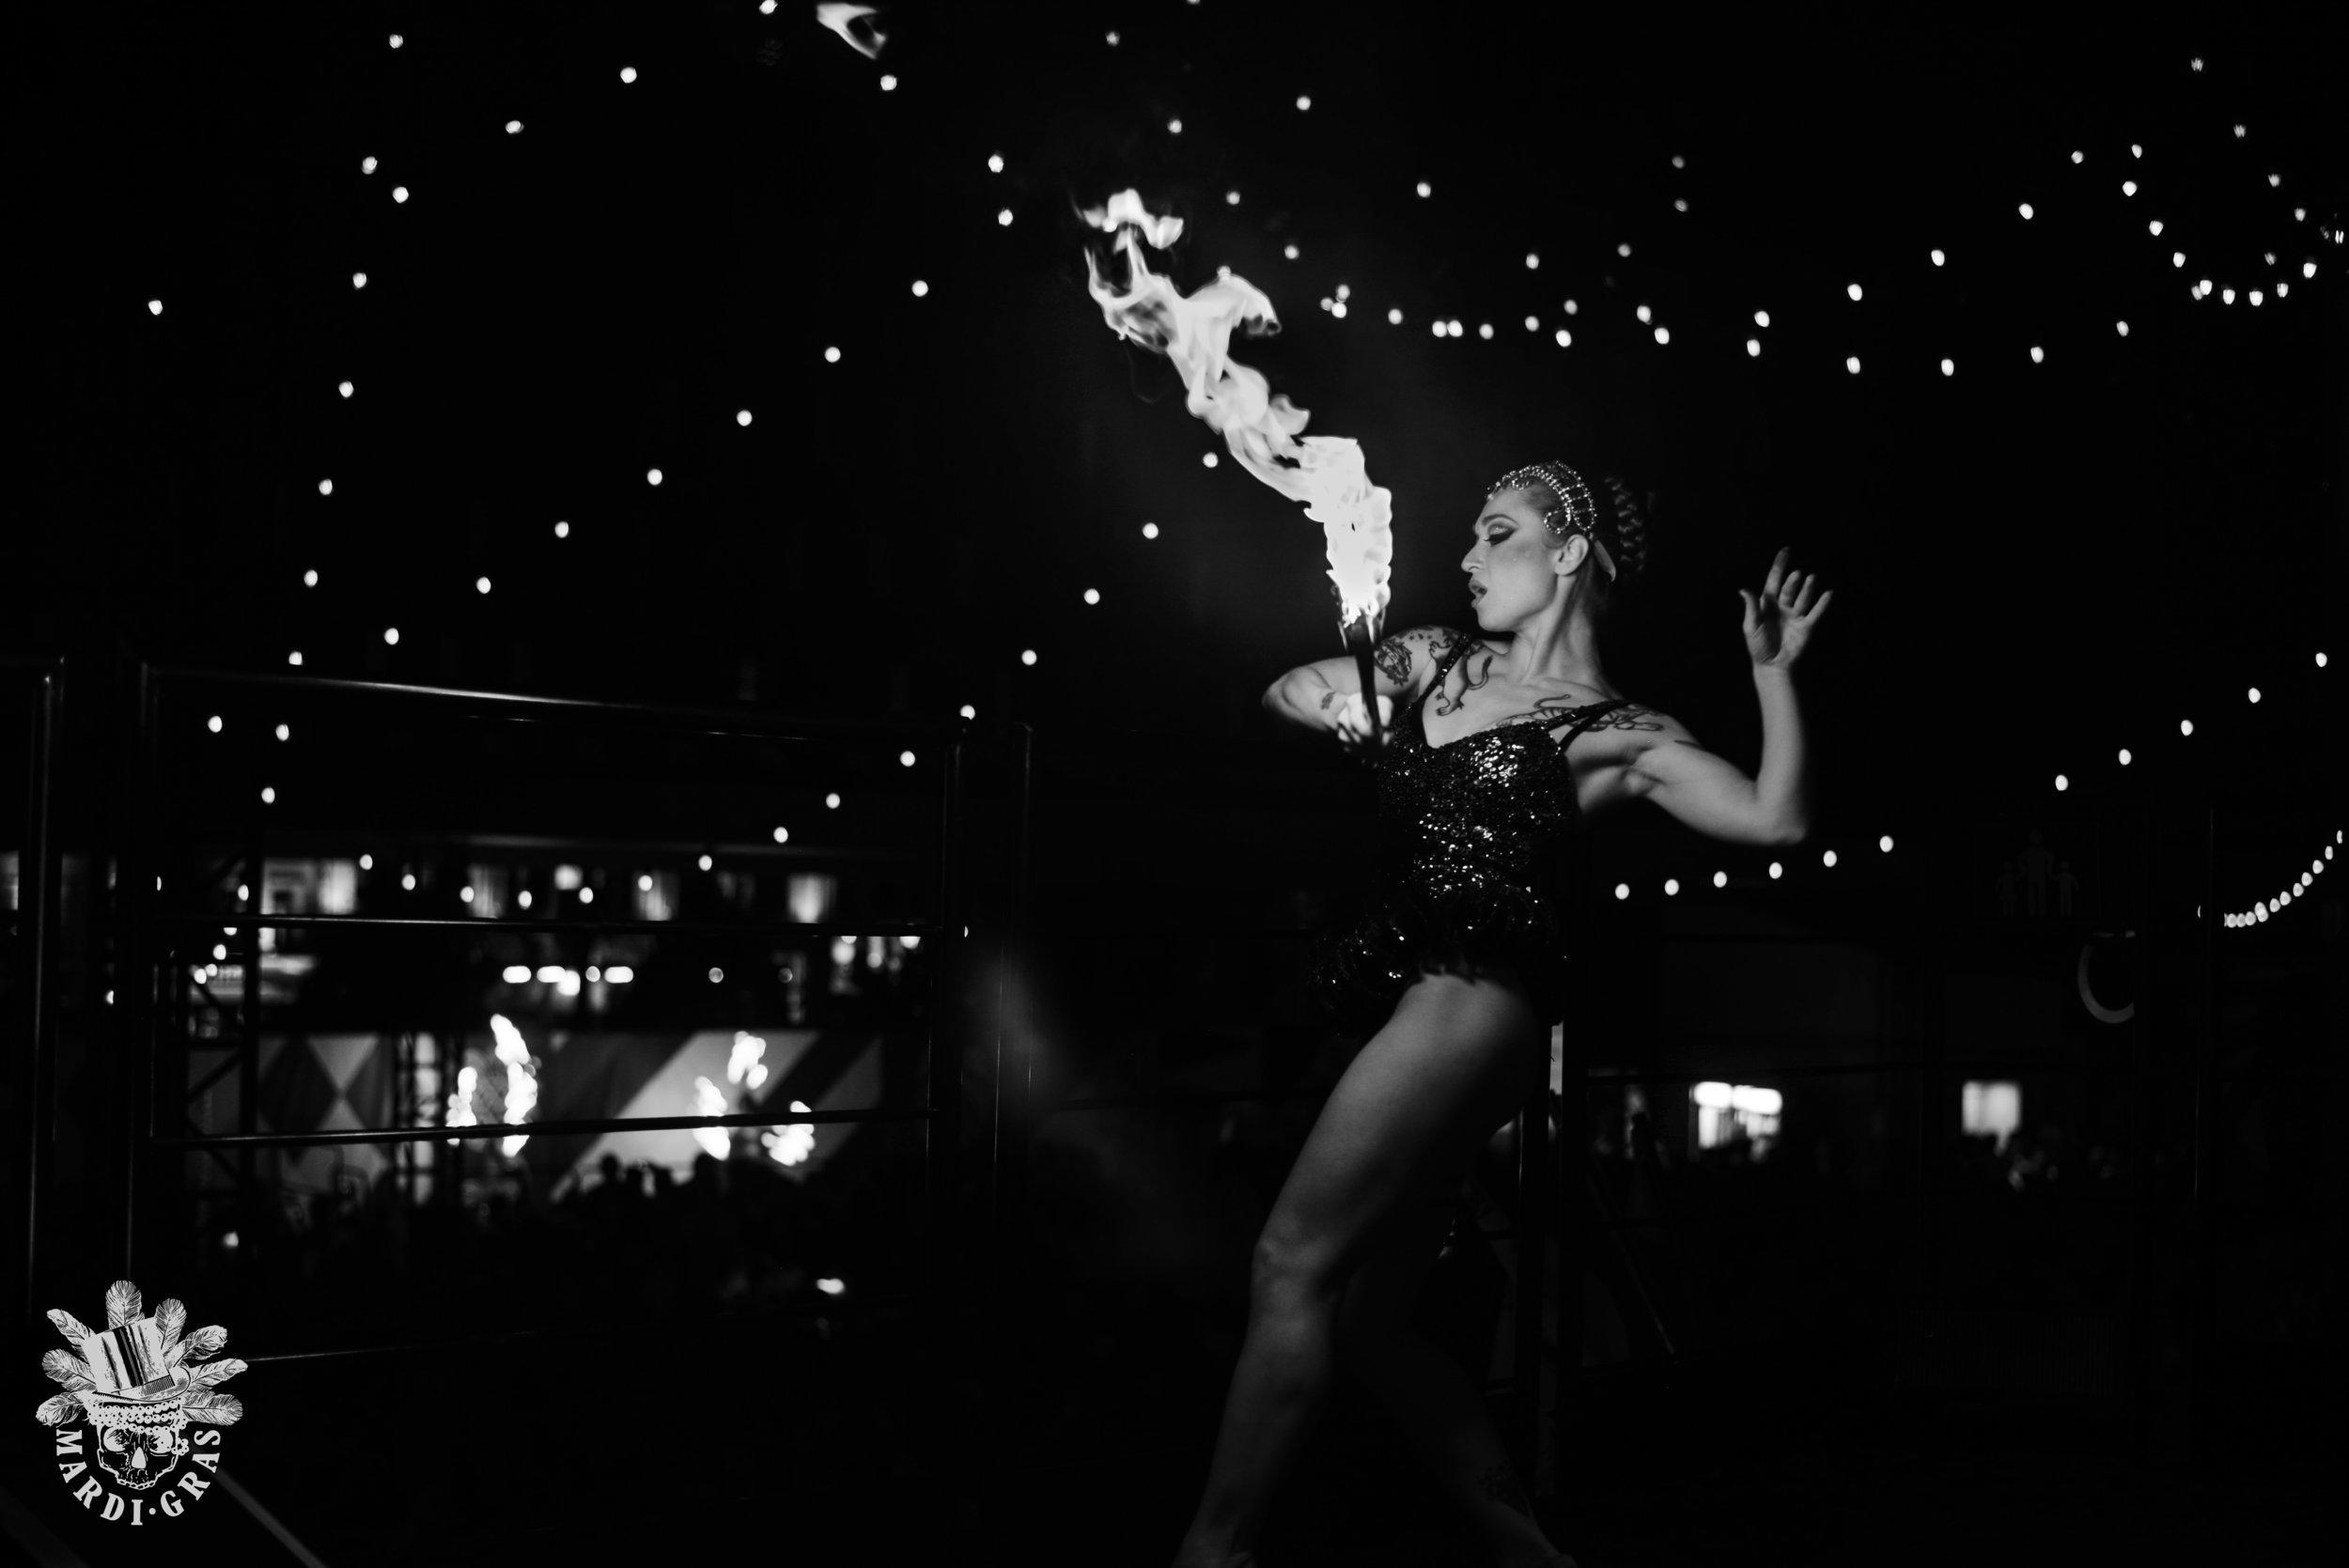 20160724 © Alexander Deprez | Mardi Gras | Gentse Feesten BE Janet Fischietto 1.jpg